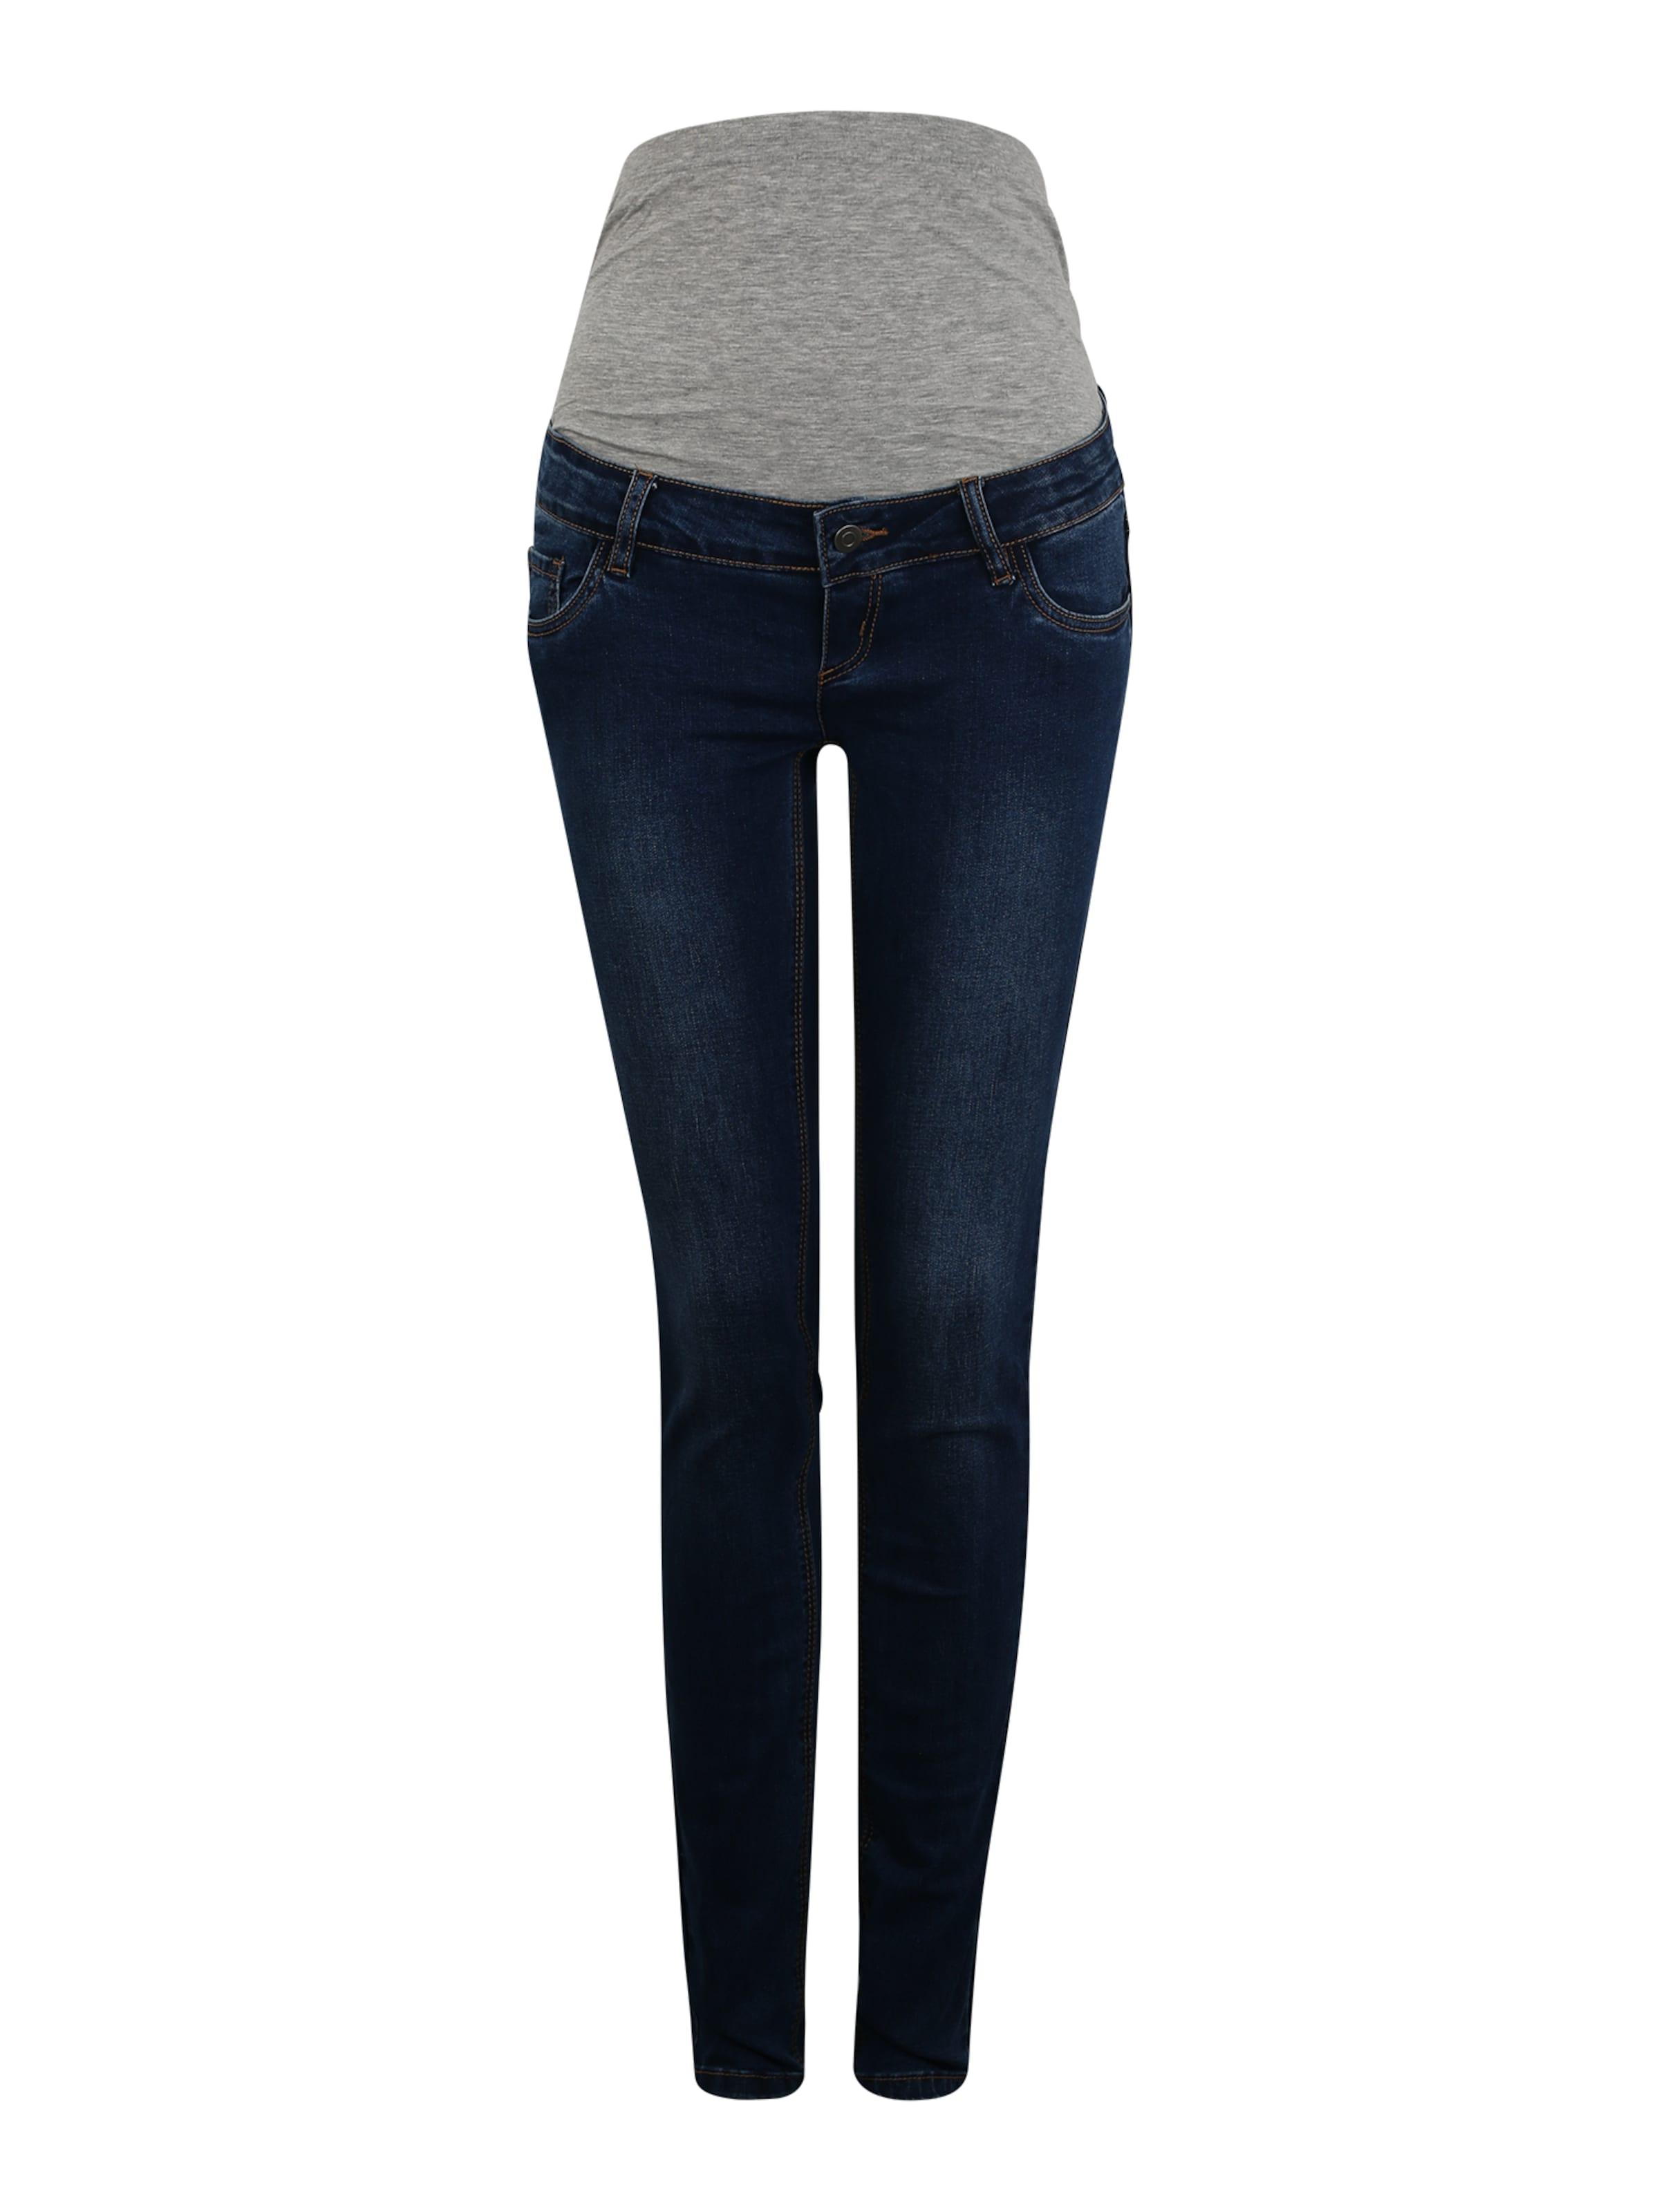 Mamalicious 'mllola' Blauw In Jeans Denim TJcK1lF